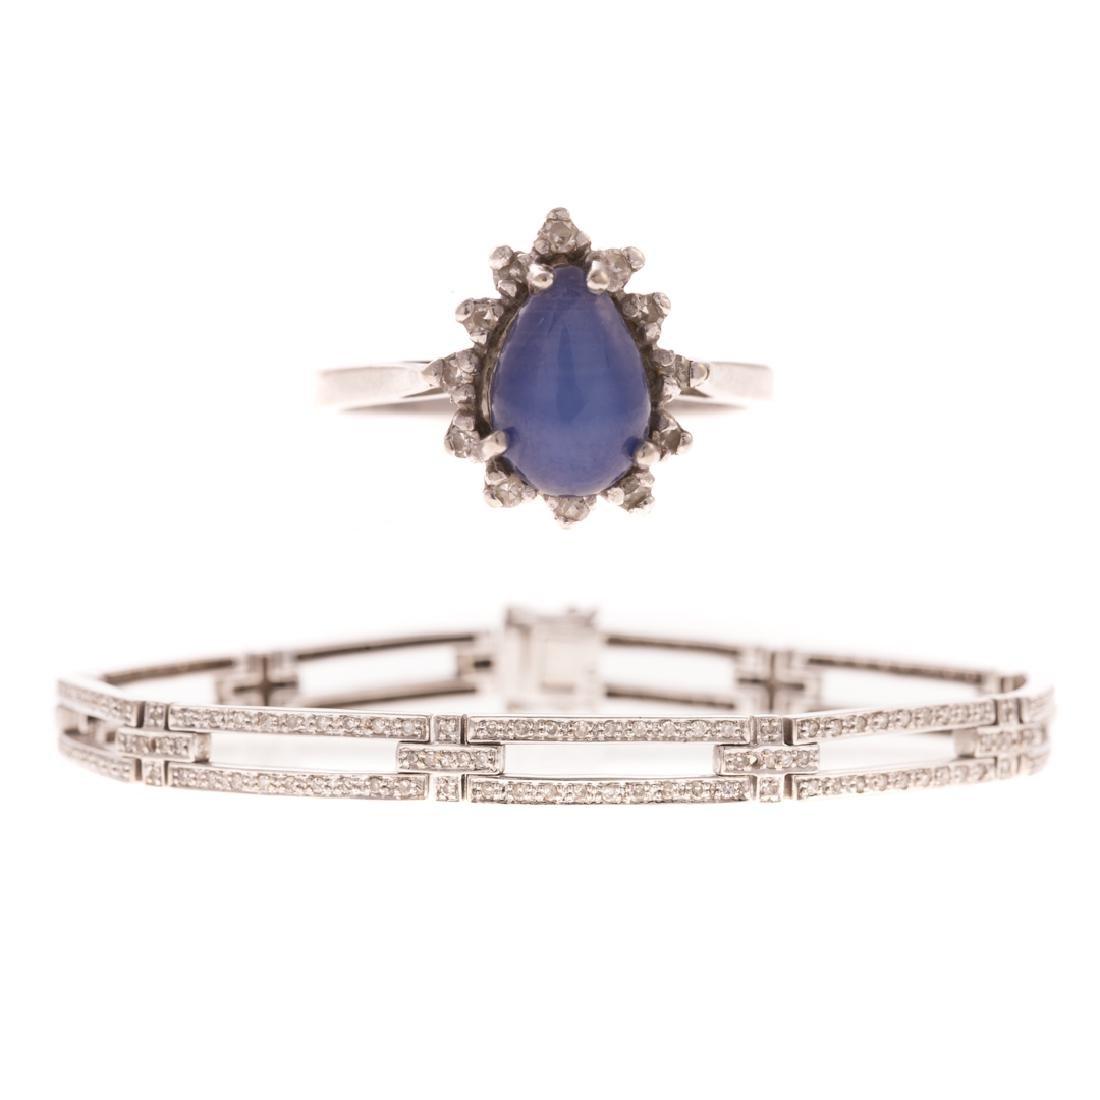 A Lady's White Gold Diamond Bracelet & Ring